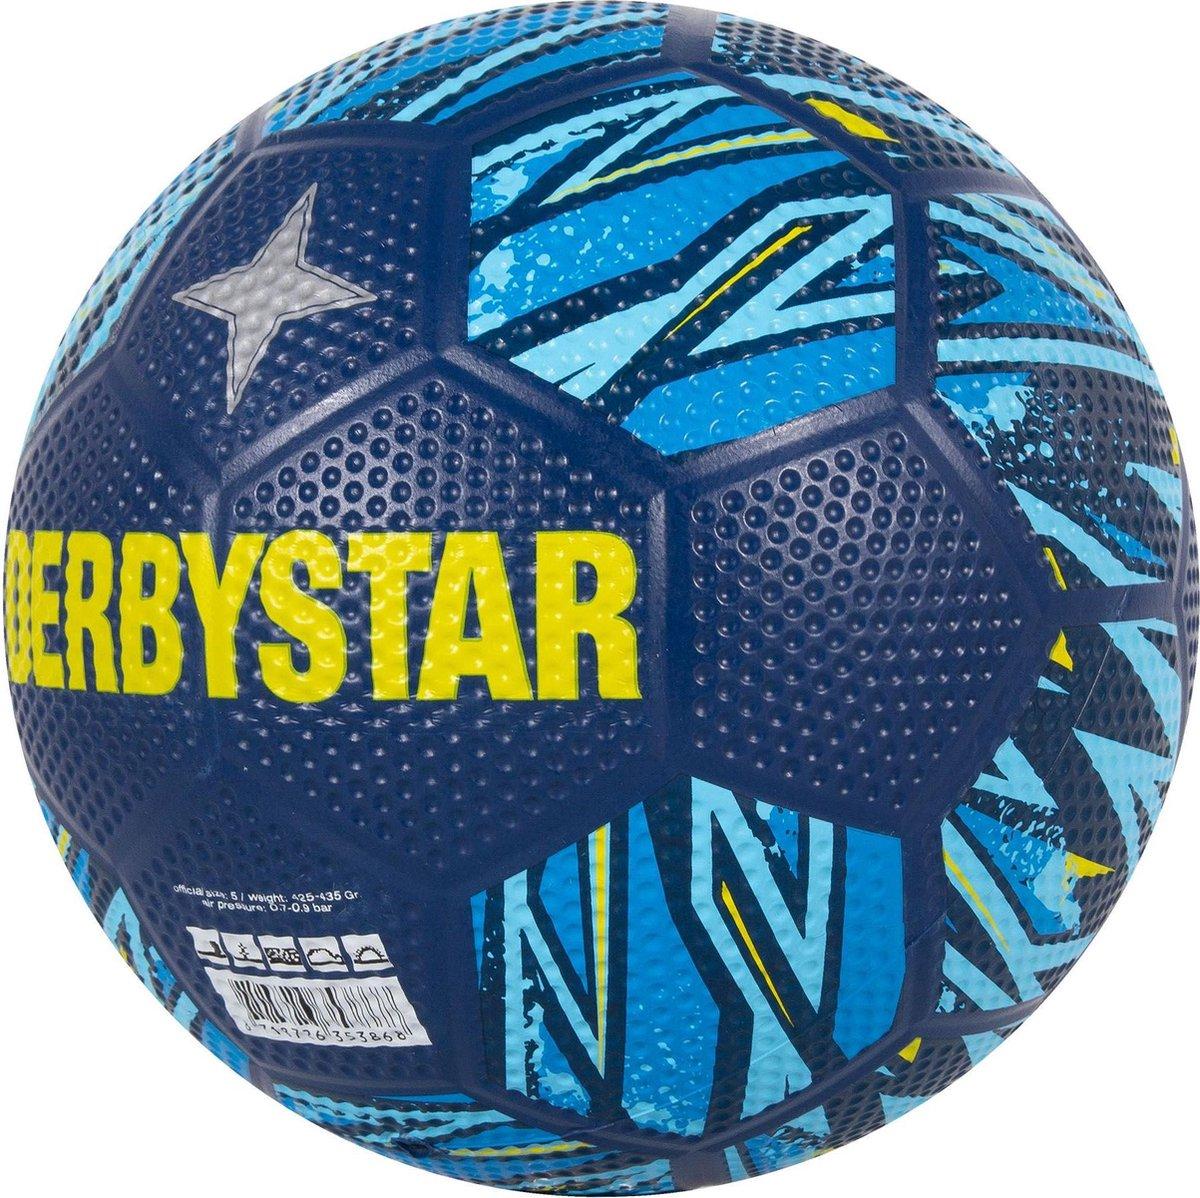 Derbystar Streetball Voetbal Unisex - Maat 5